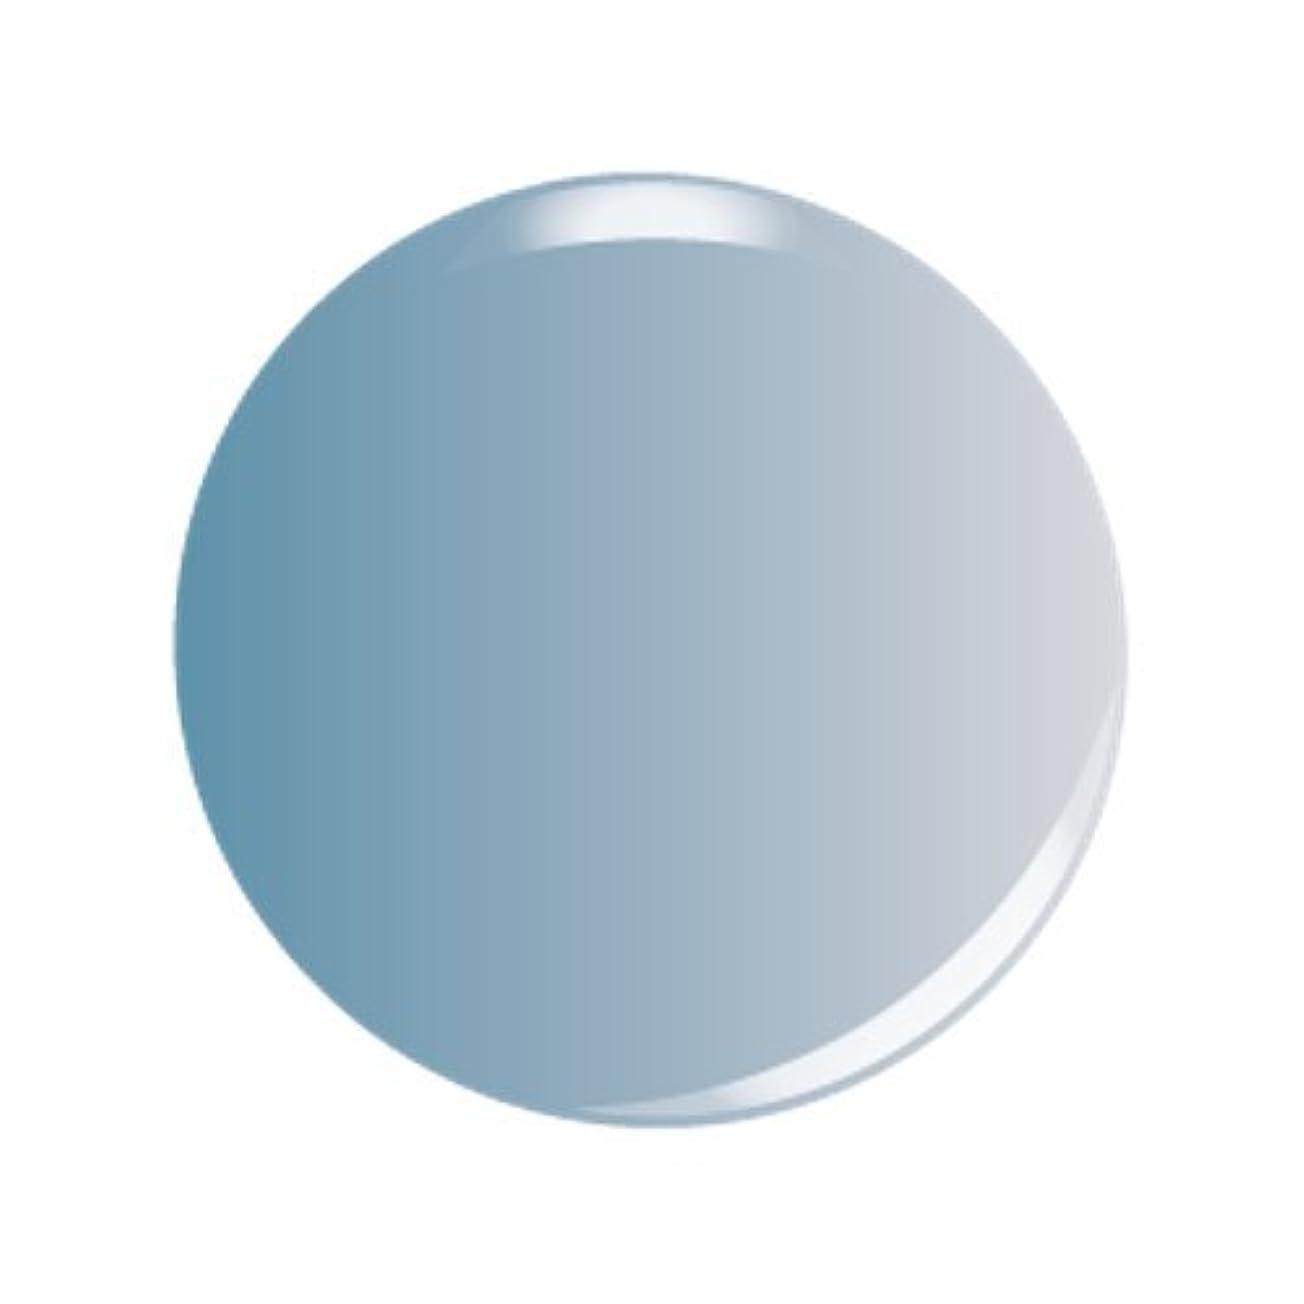 年金赤道銀行Kiara Sky's mood changing gel polish - OMBRE (GLASS SLIPPERS #801) by Kiara Sky